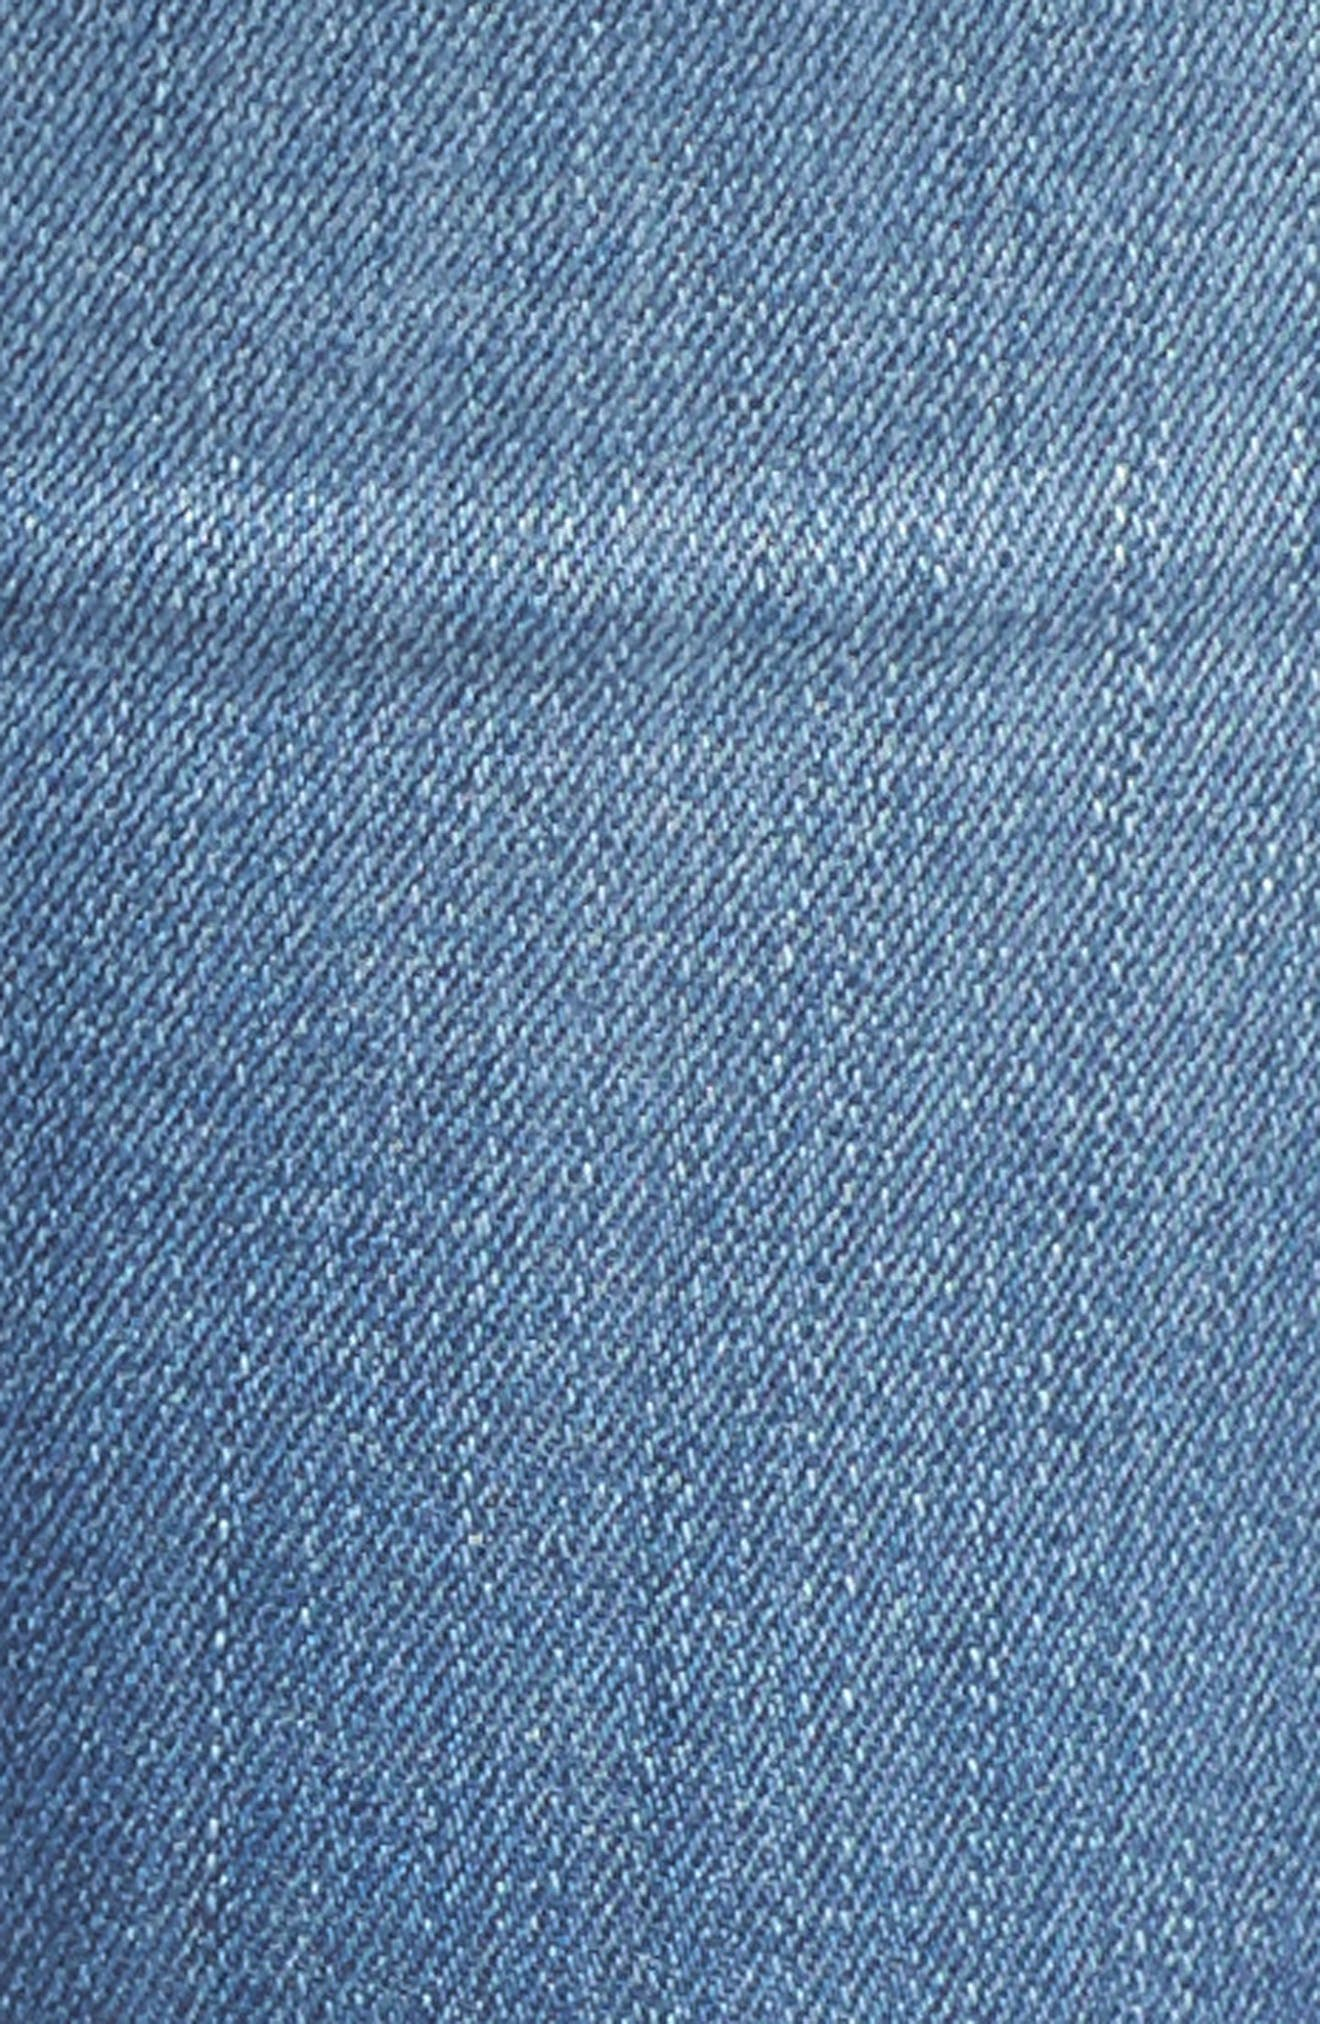 Alternate Image 5  - Hudson Jeans Collin Skinny Jeans (Sentimental)